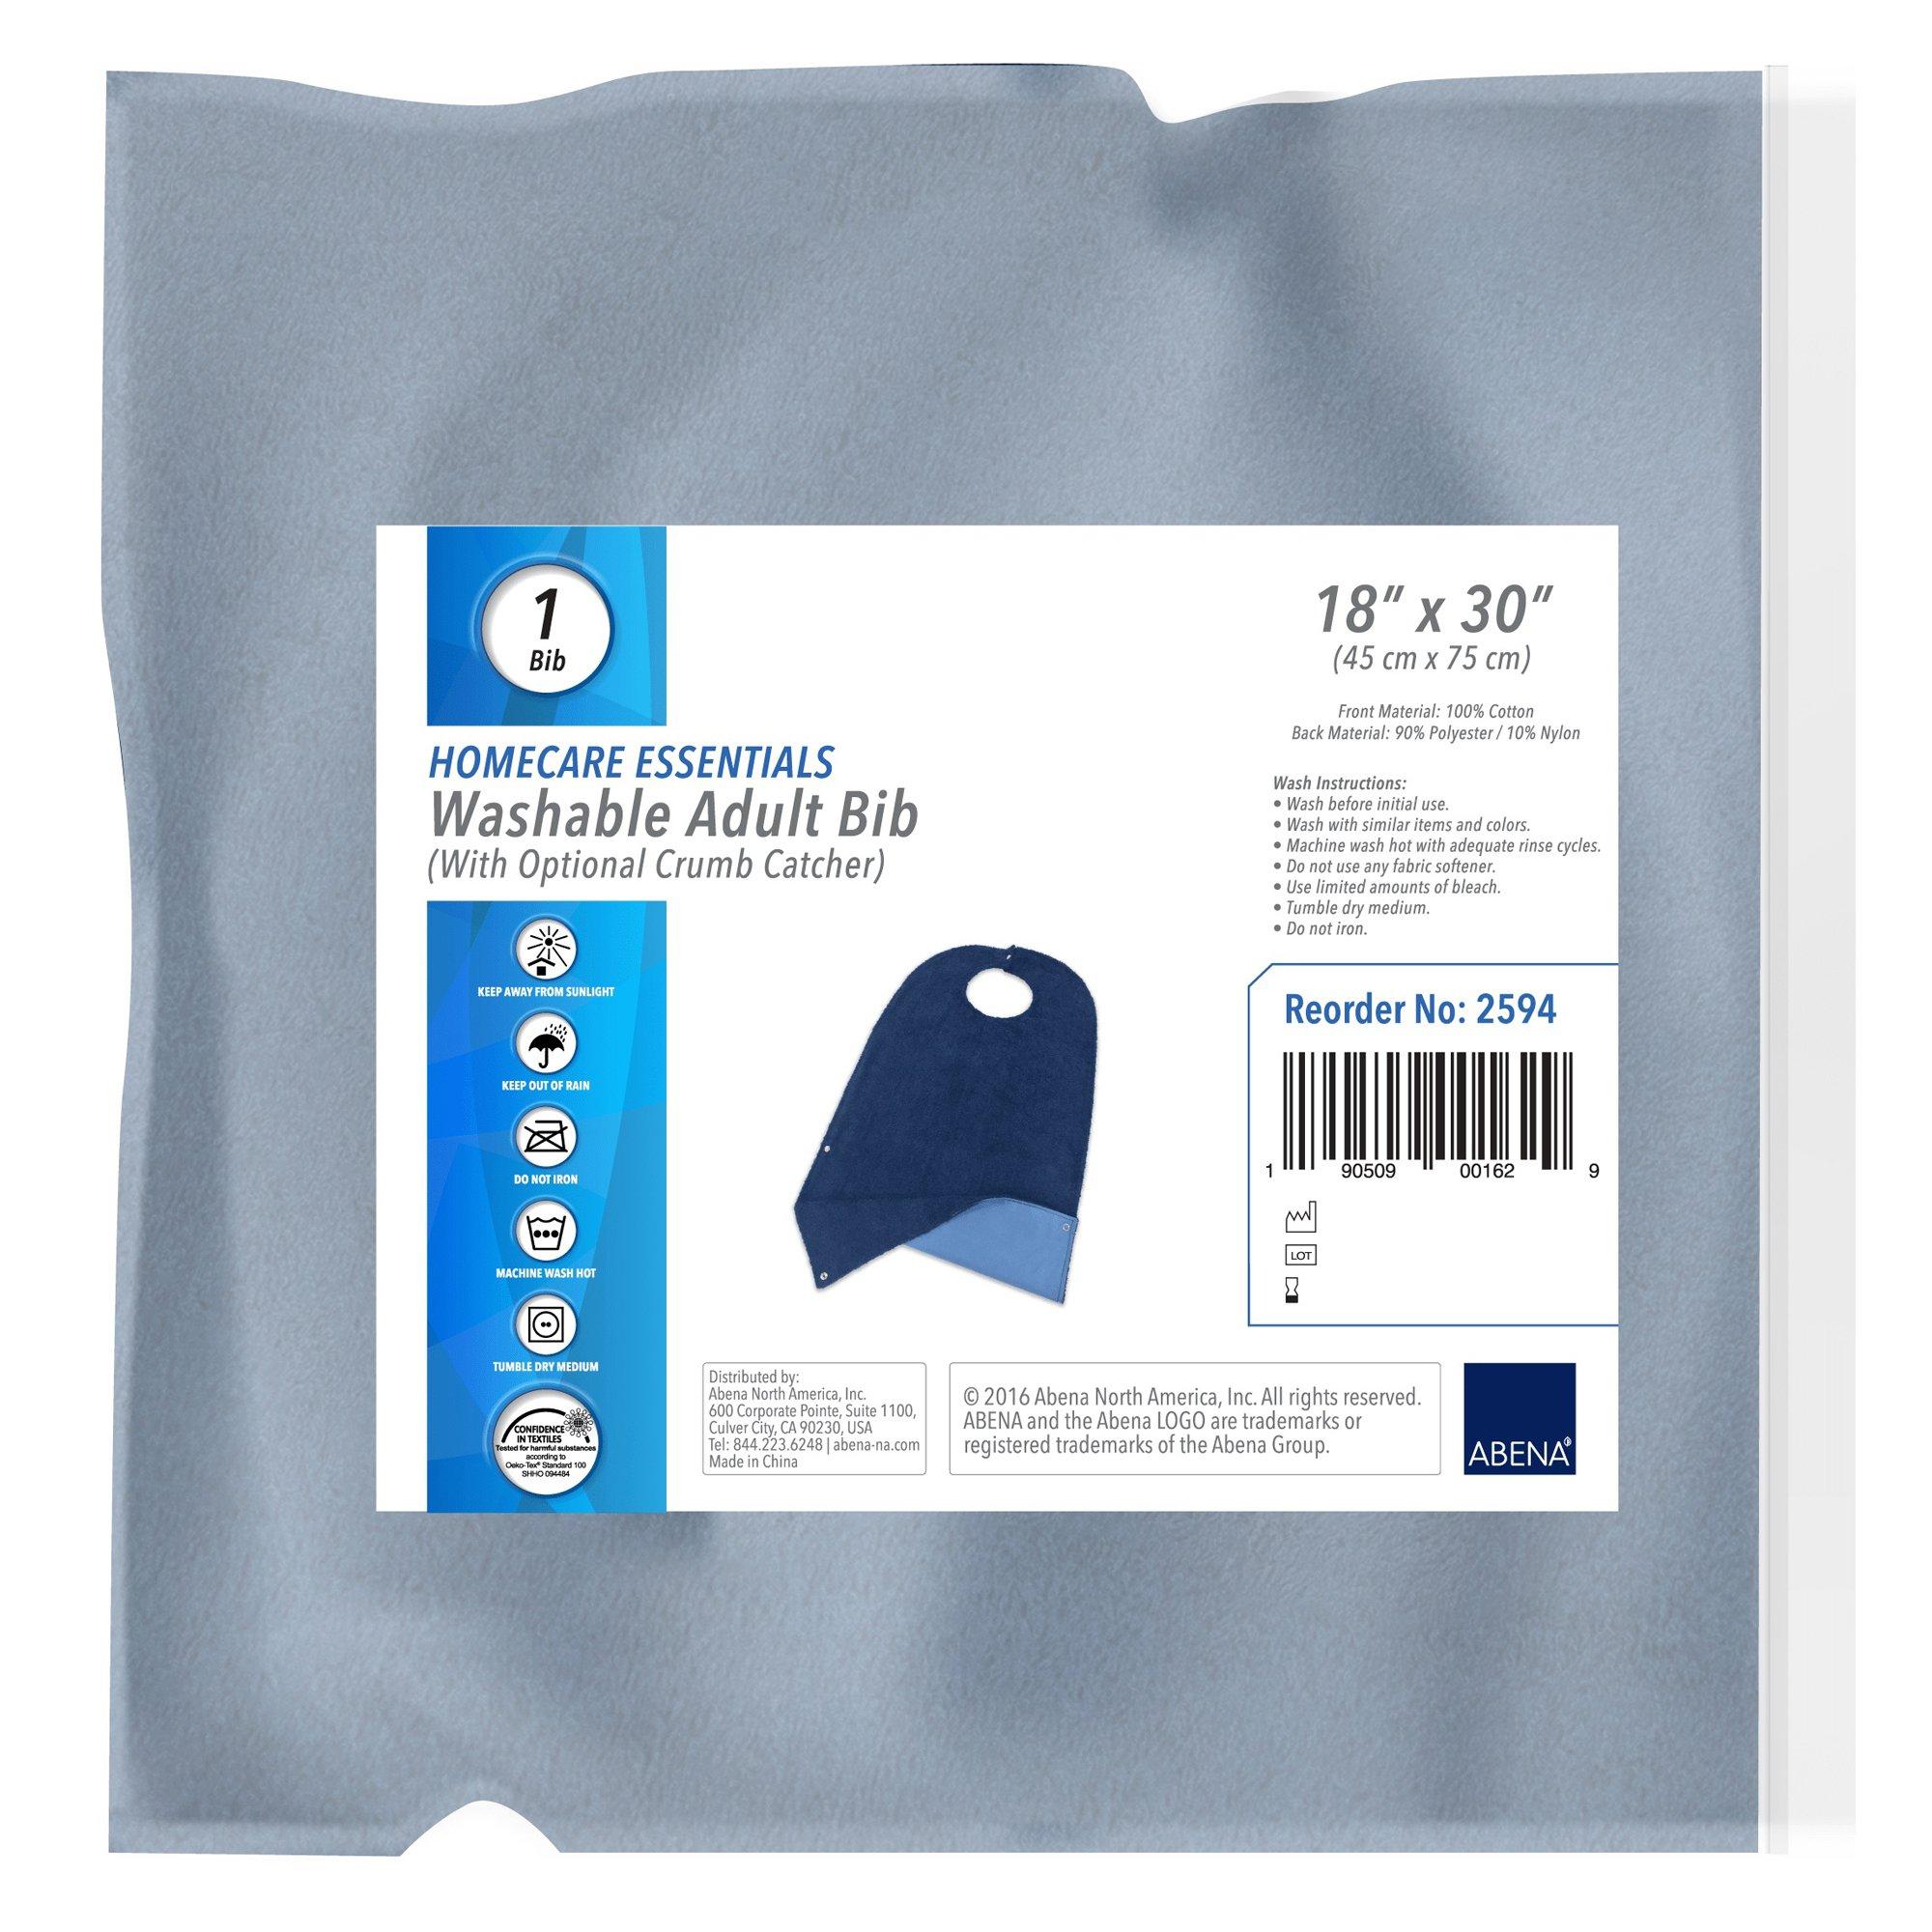 Abena Homecare Essentials Washable Adult Bib with Optional Crumb Catcher, 2594, 1 Each